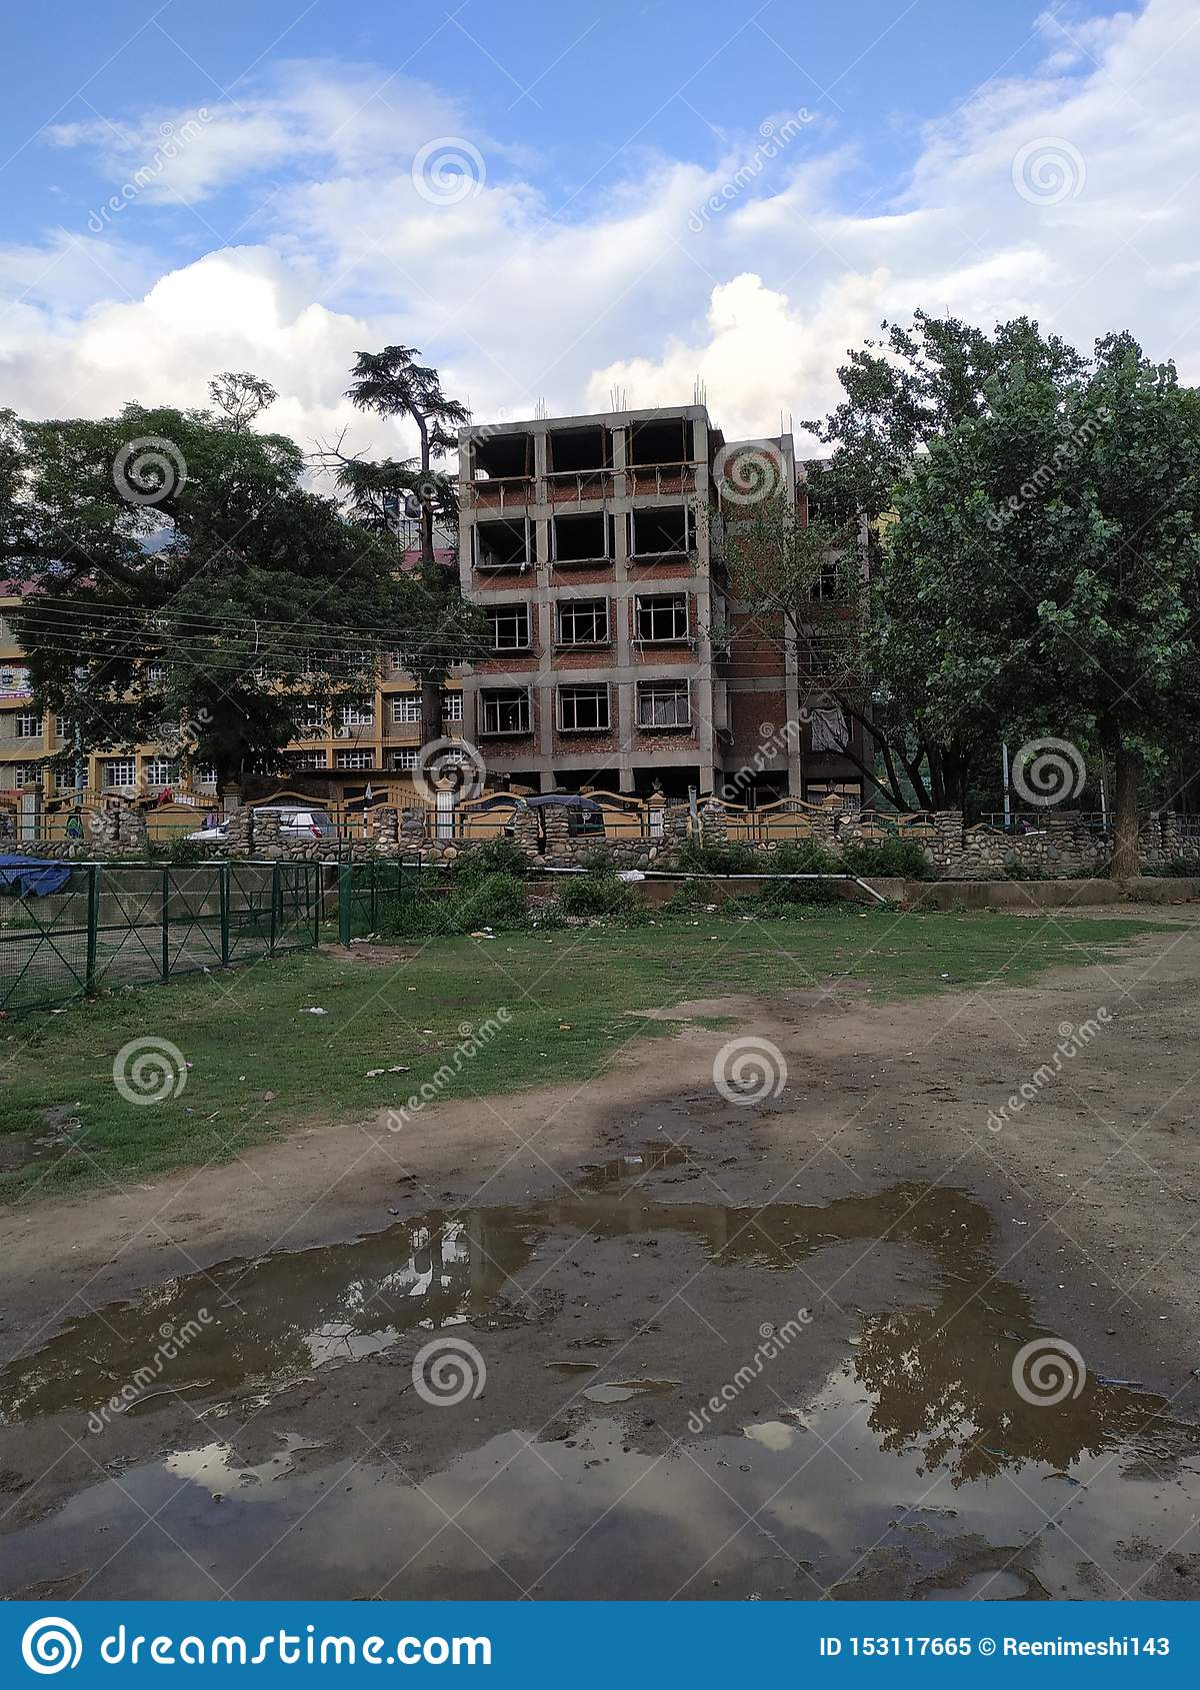 A constructing building